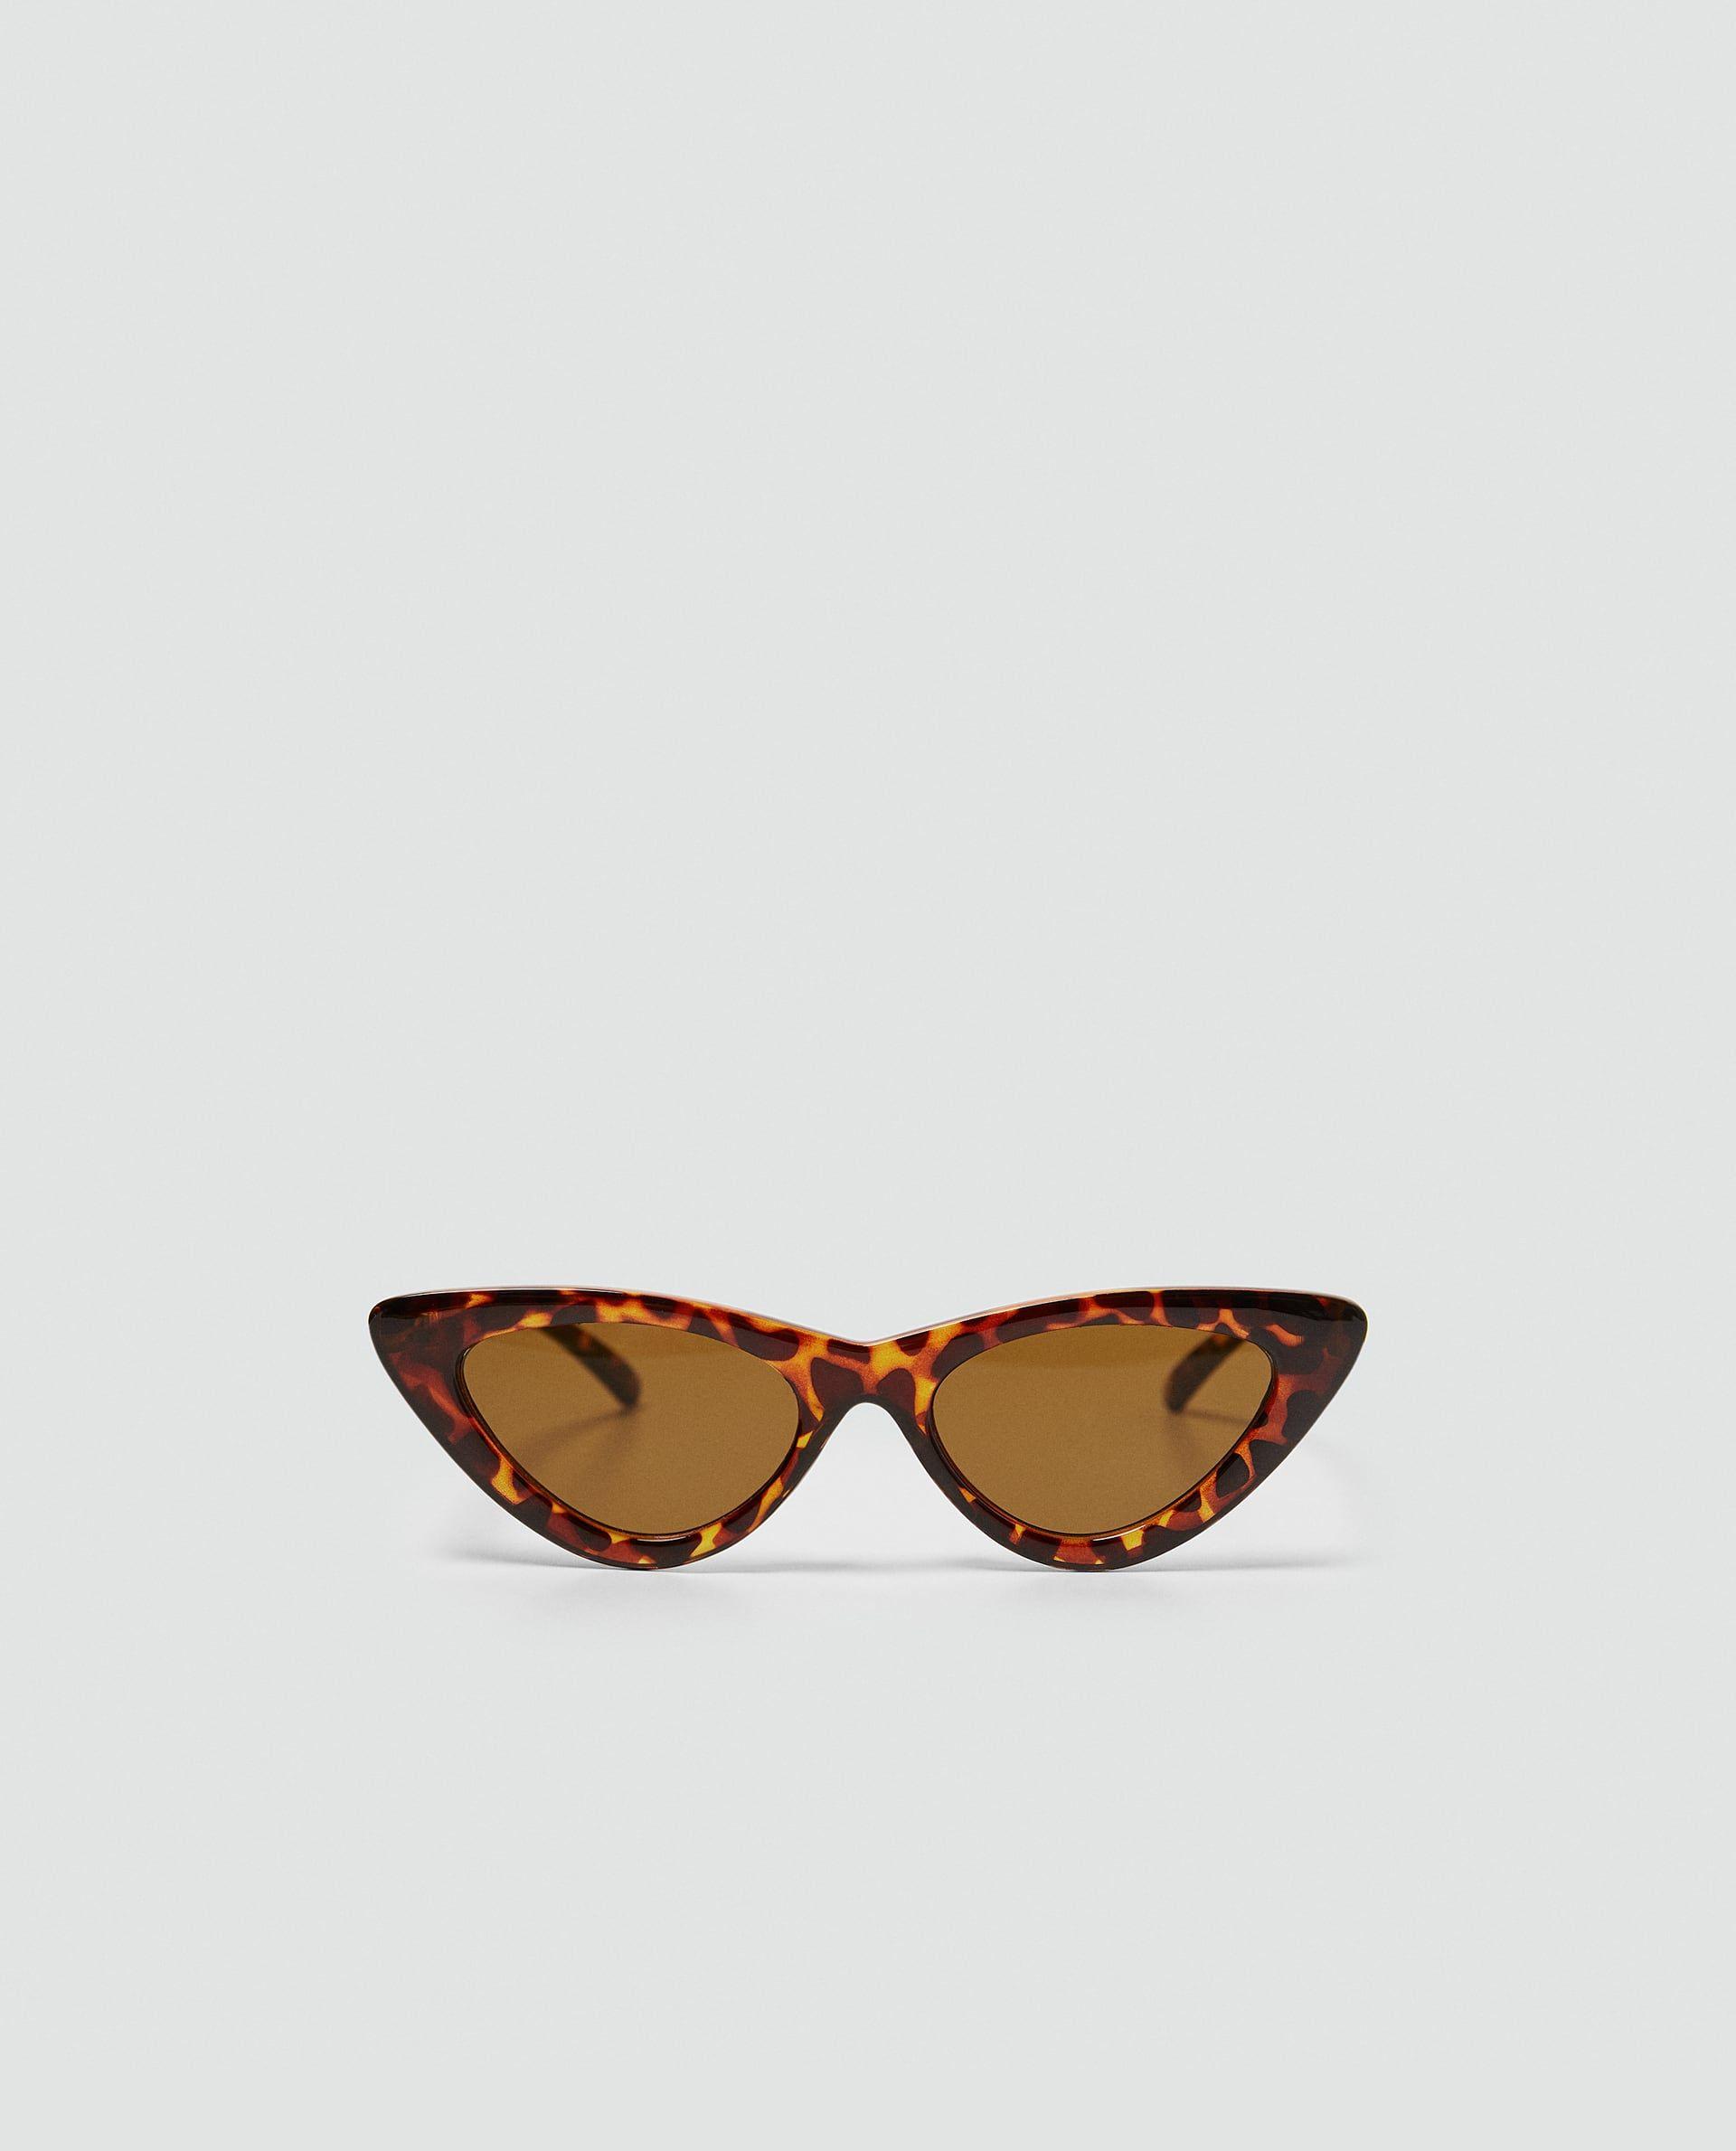 PopbelaOOTD  Koleksi Kacamata Retro yang Wajib Punya 65373b1984